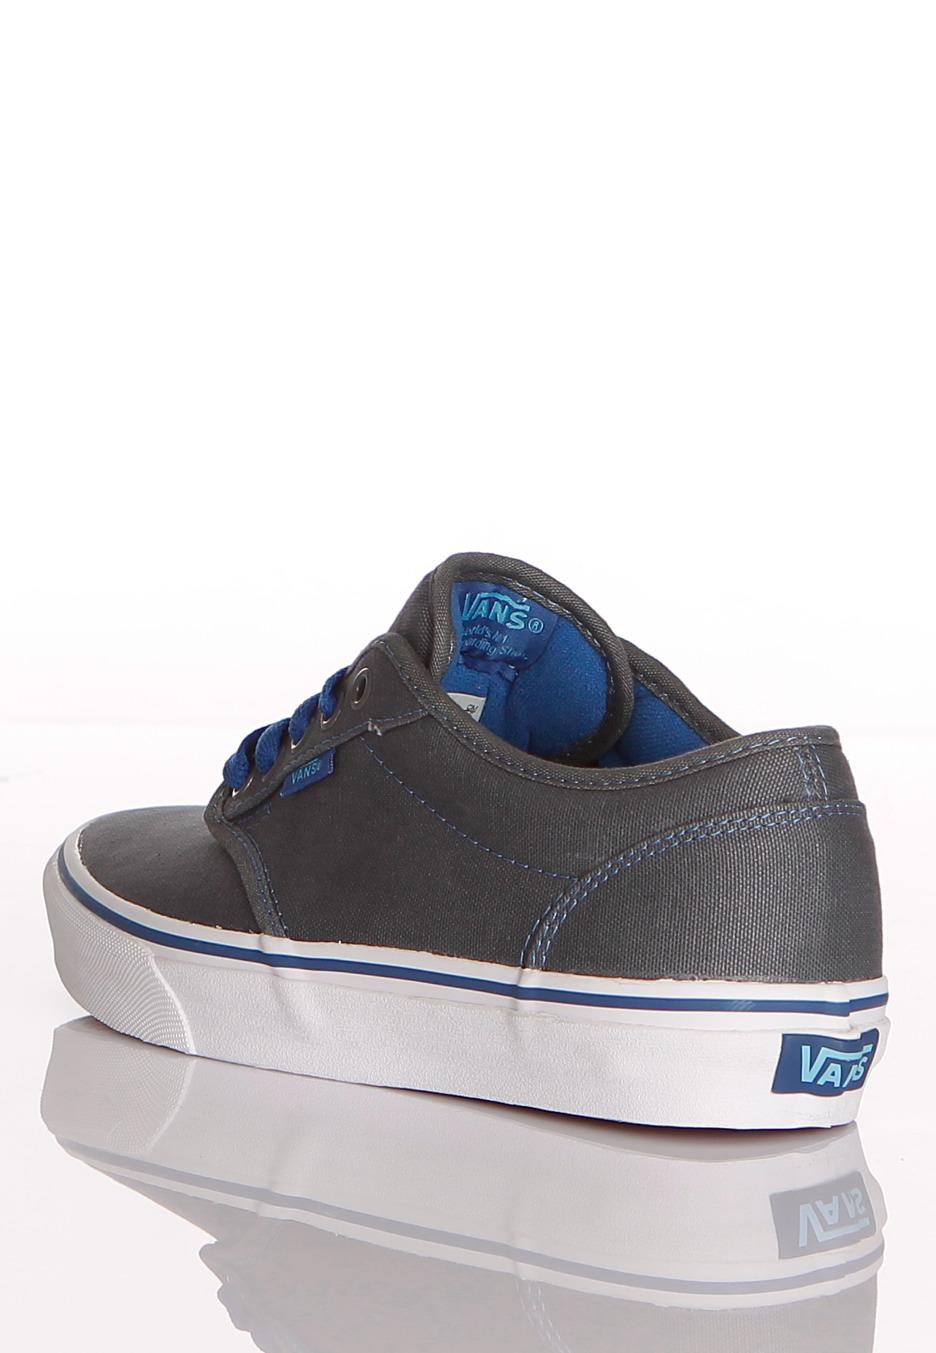 b216807b9f3489 Vans - Atwood Grey Teal Blue - Skor för tjejer - Impericon.com SE